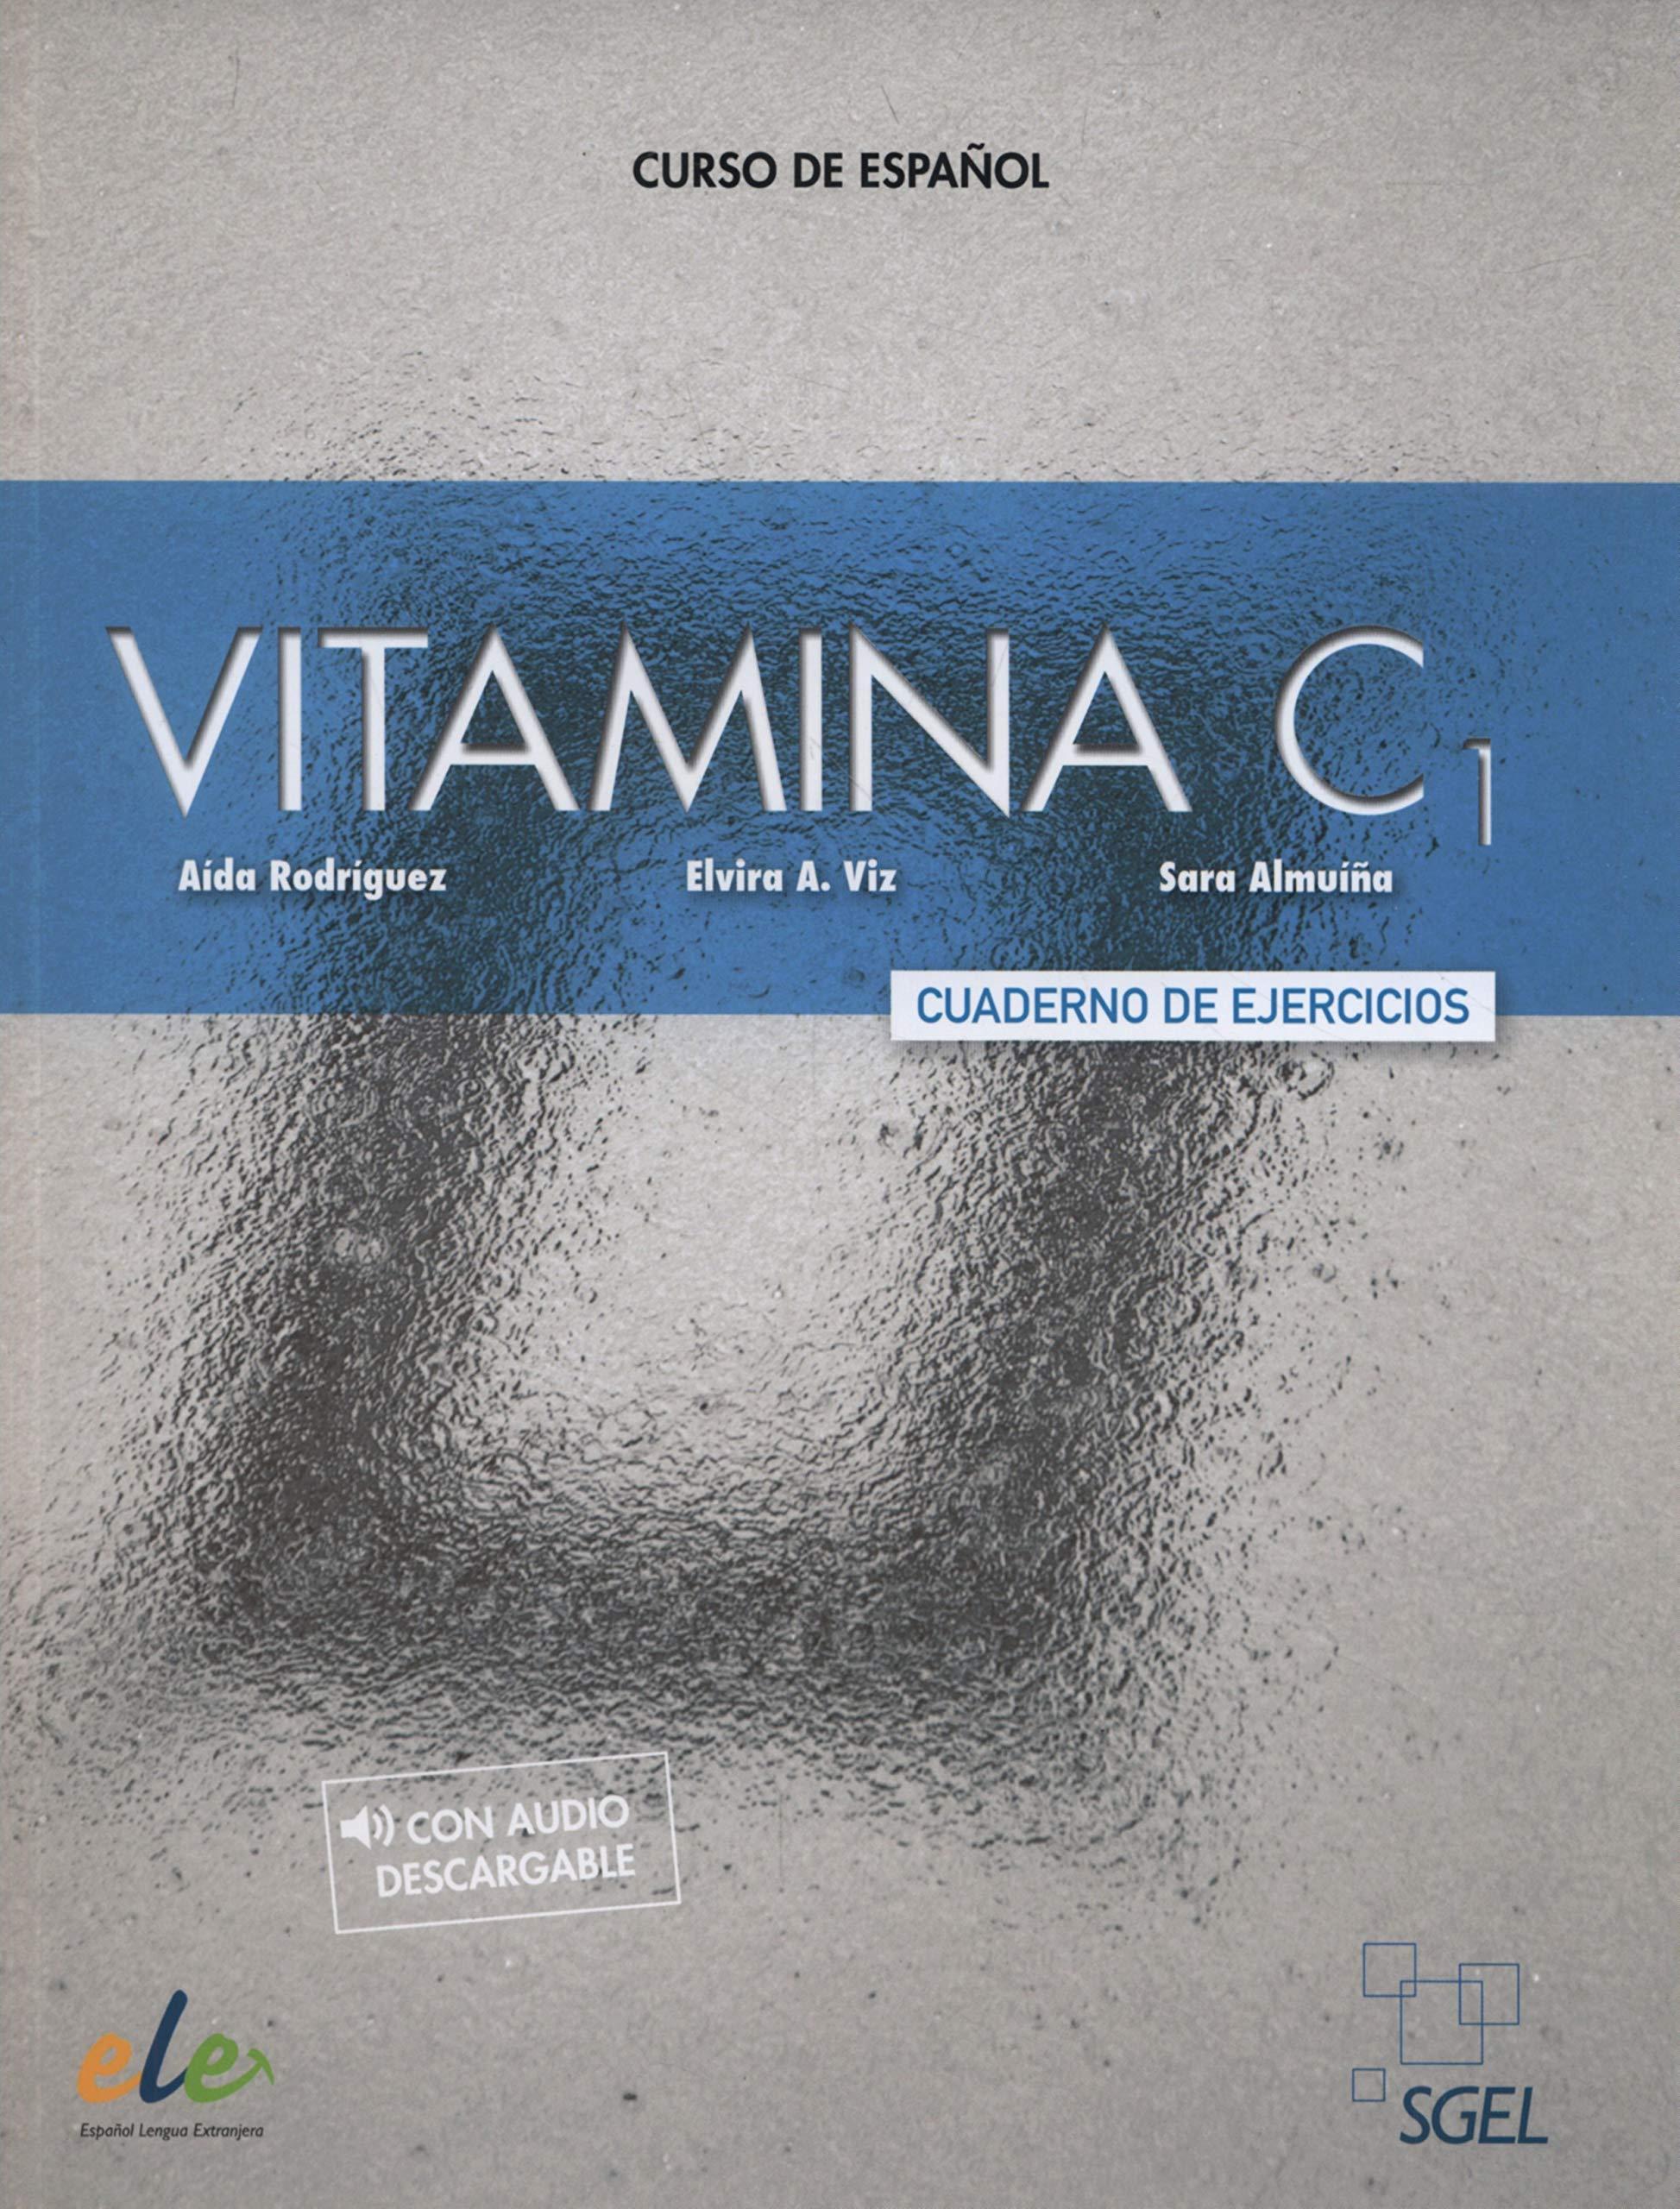 Vitamina C1. Cuaderno de ejercicios: Amazon.es: Aída Rodríguez Martínez, Elvira Almuíña Viz, Sara Almuíña Viz: Libros